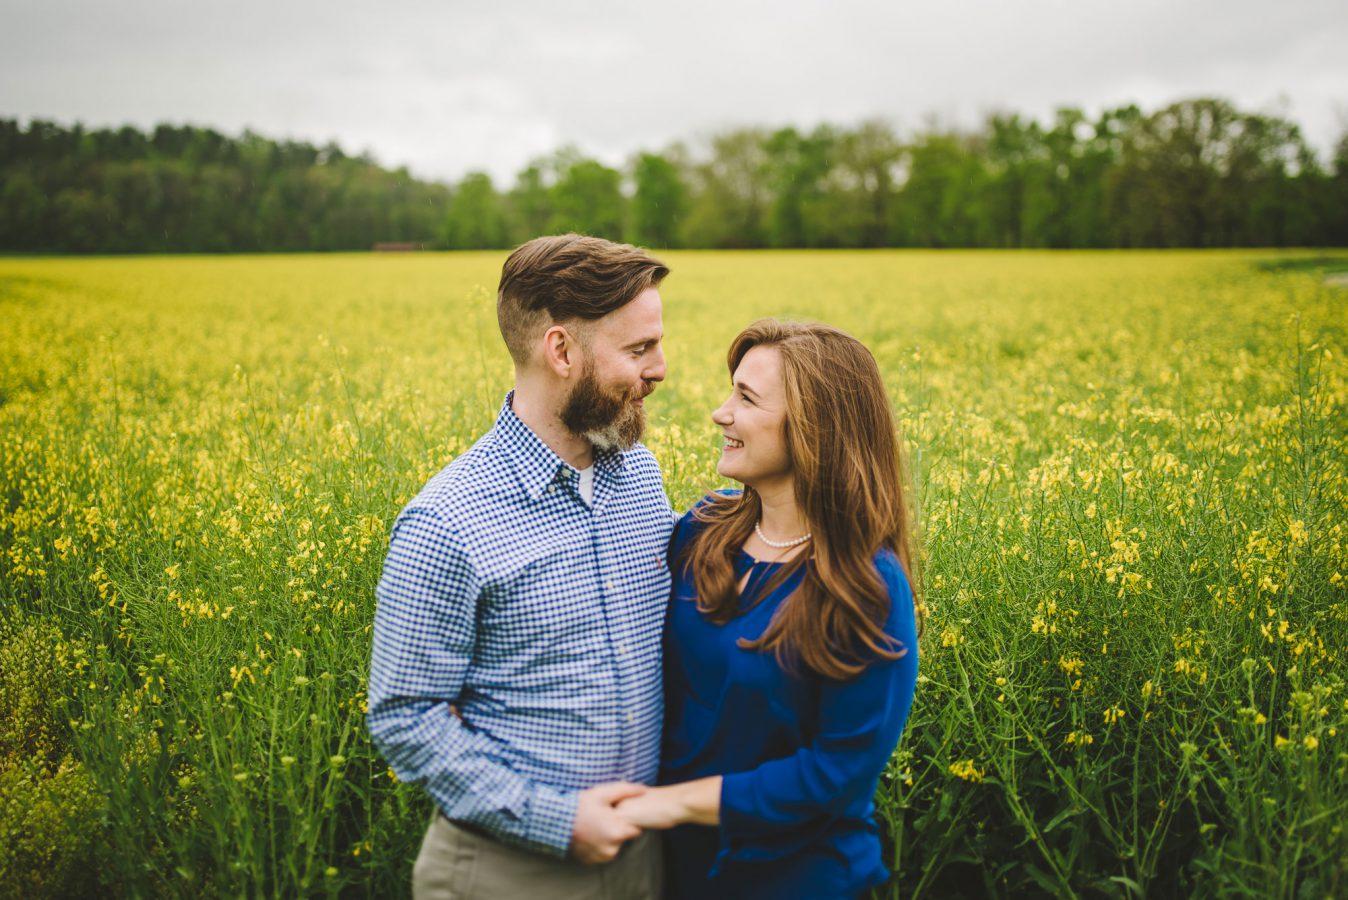 fete-photography-engagement-2017-004